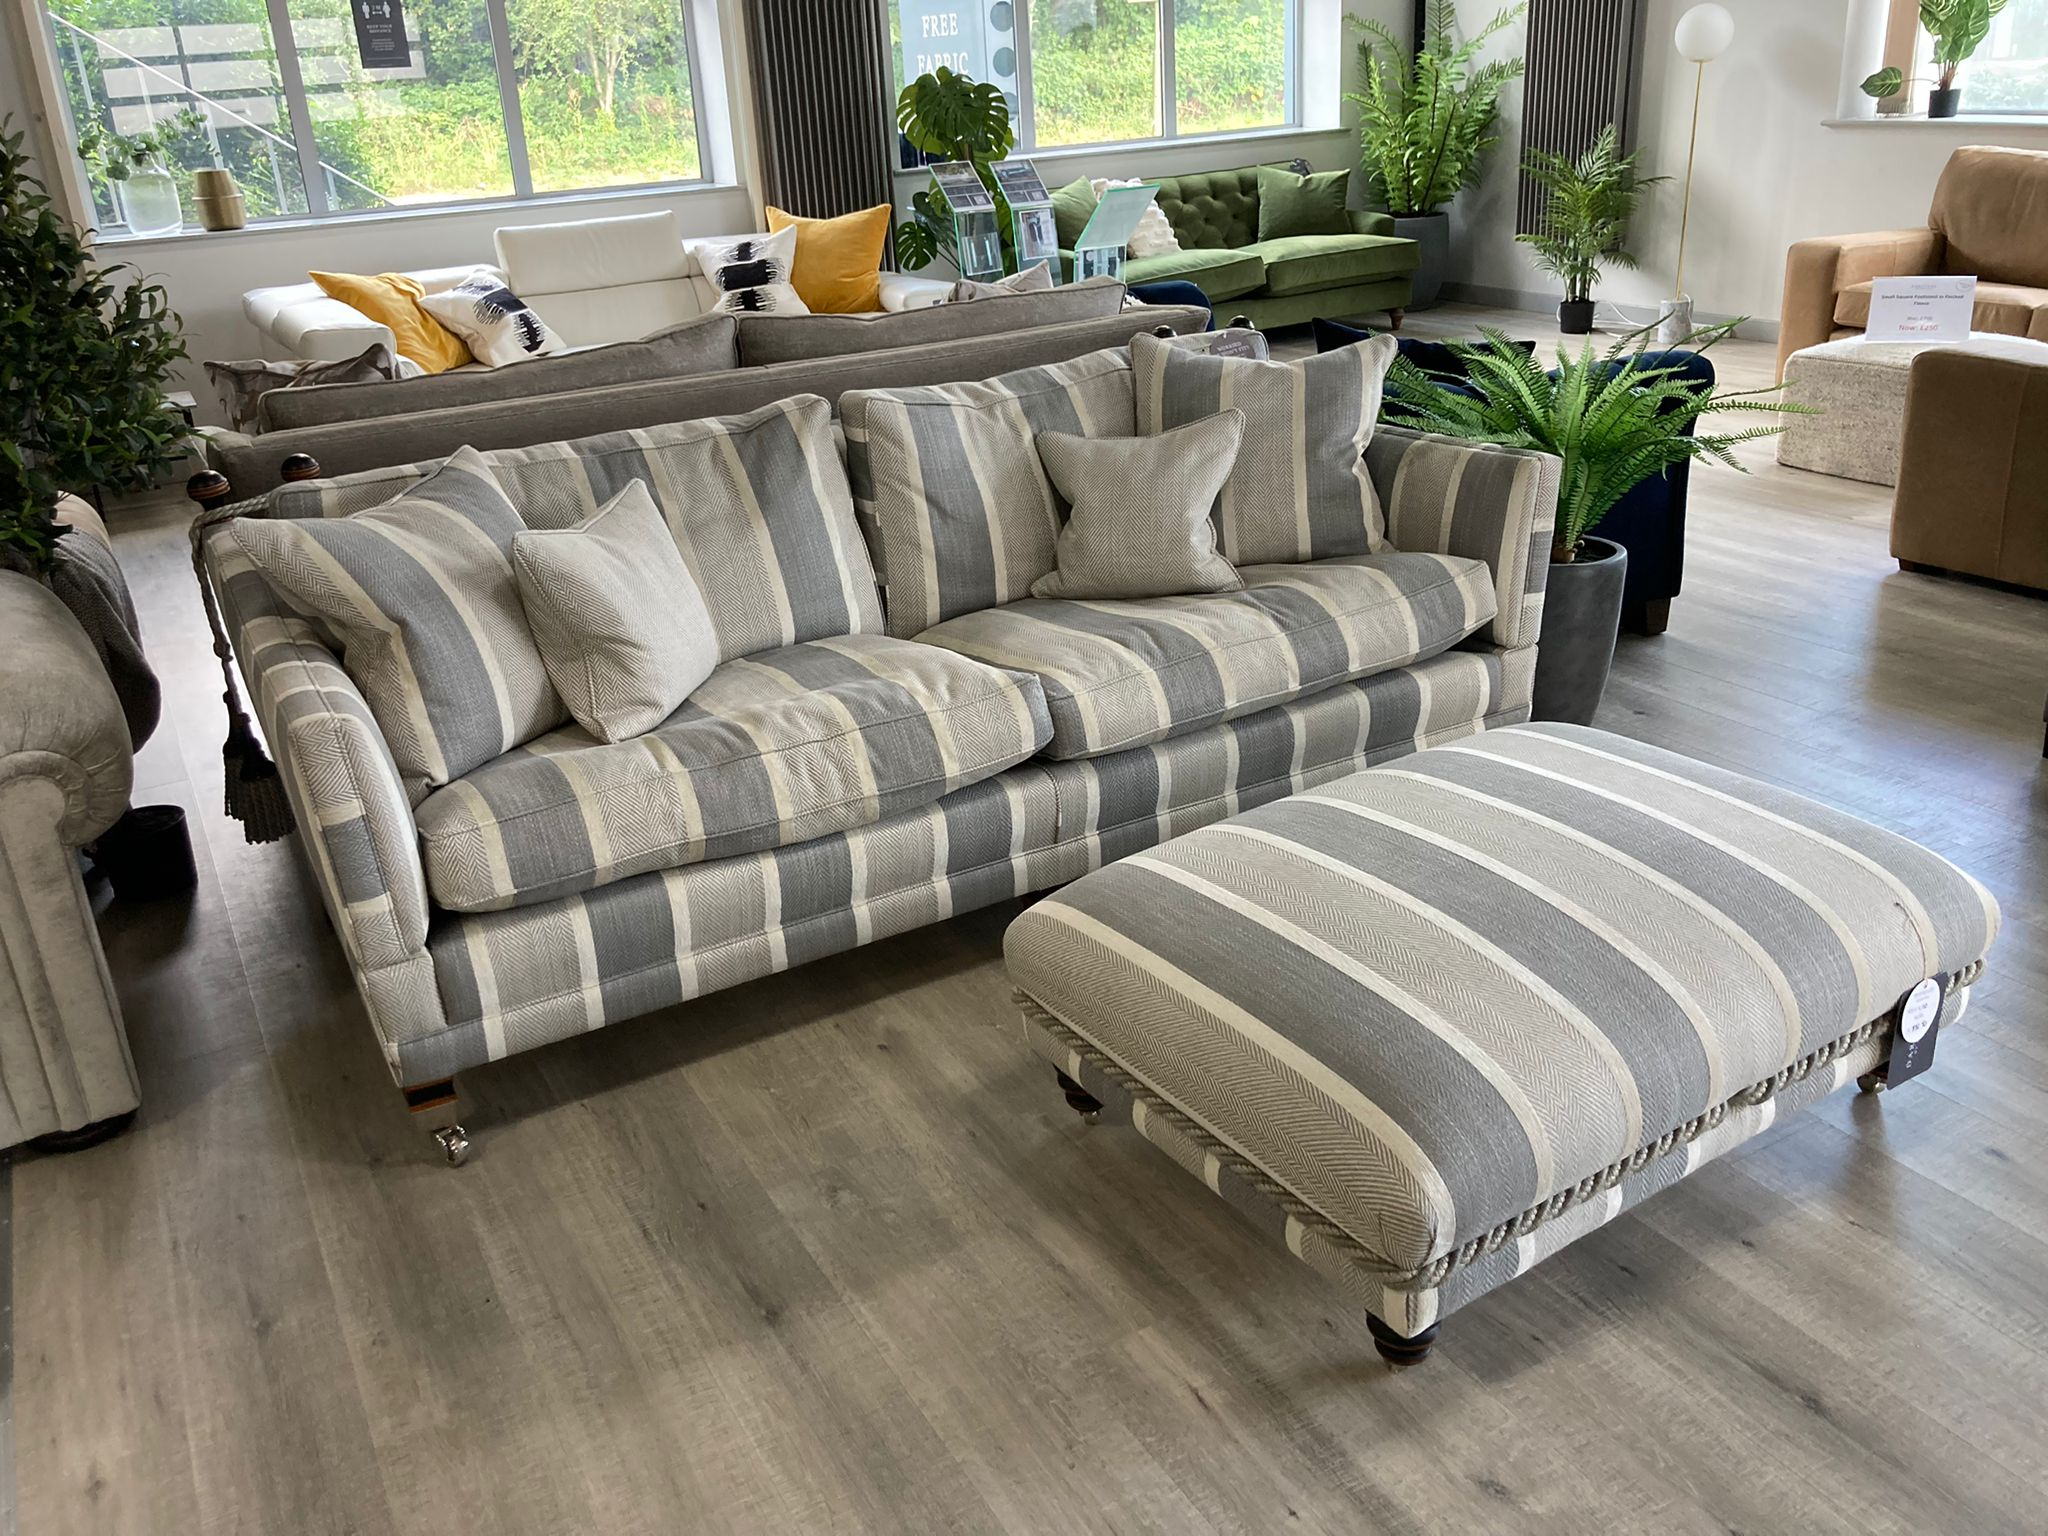 Trafalgar 3 Seater Sofa in Tangmere Silver